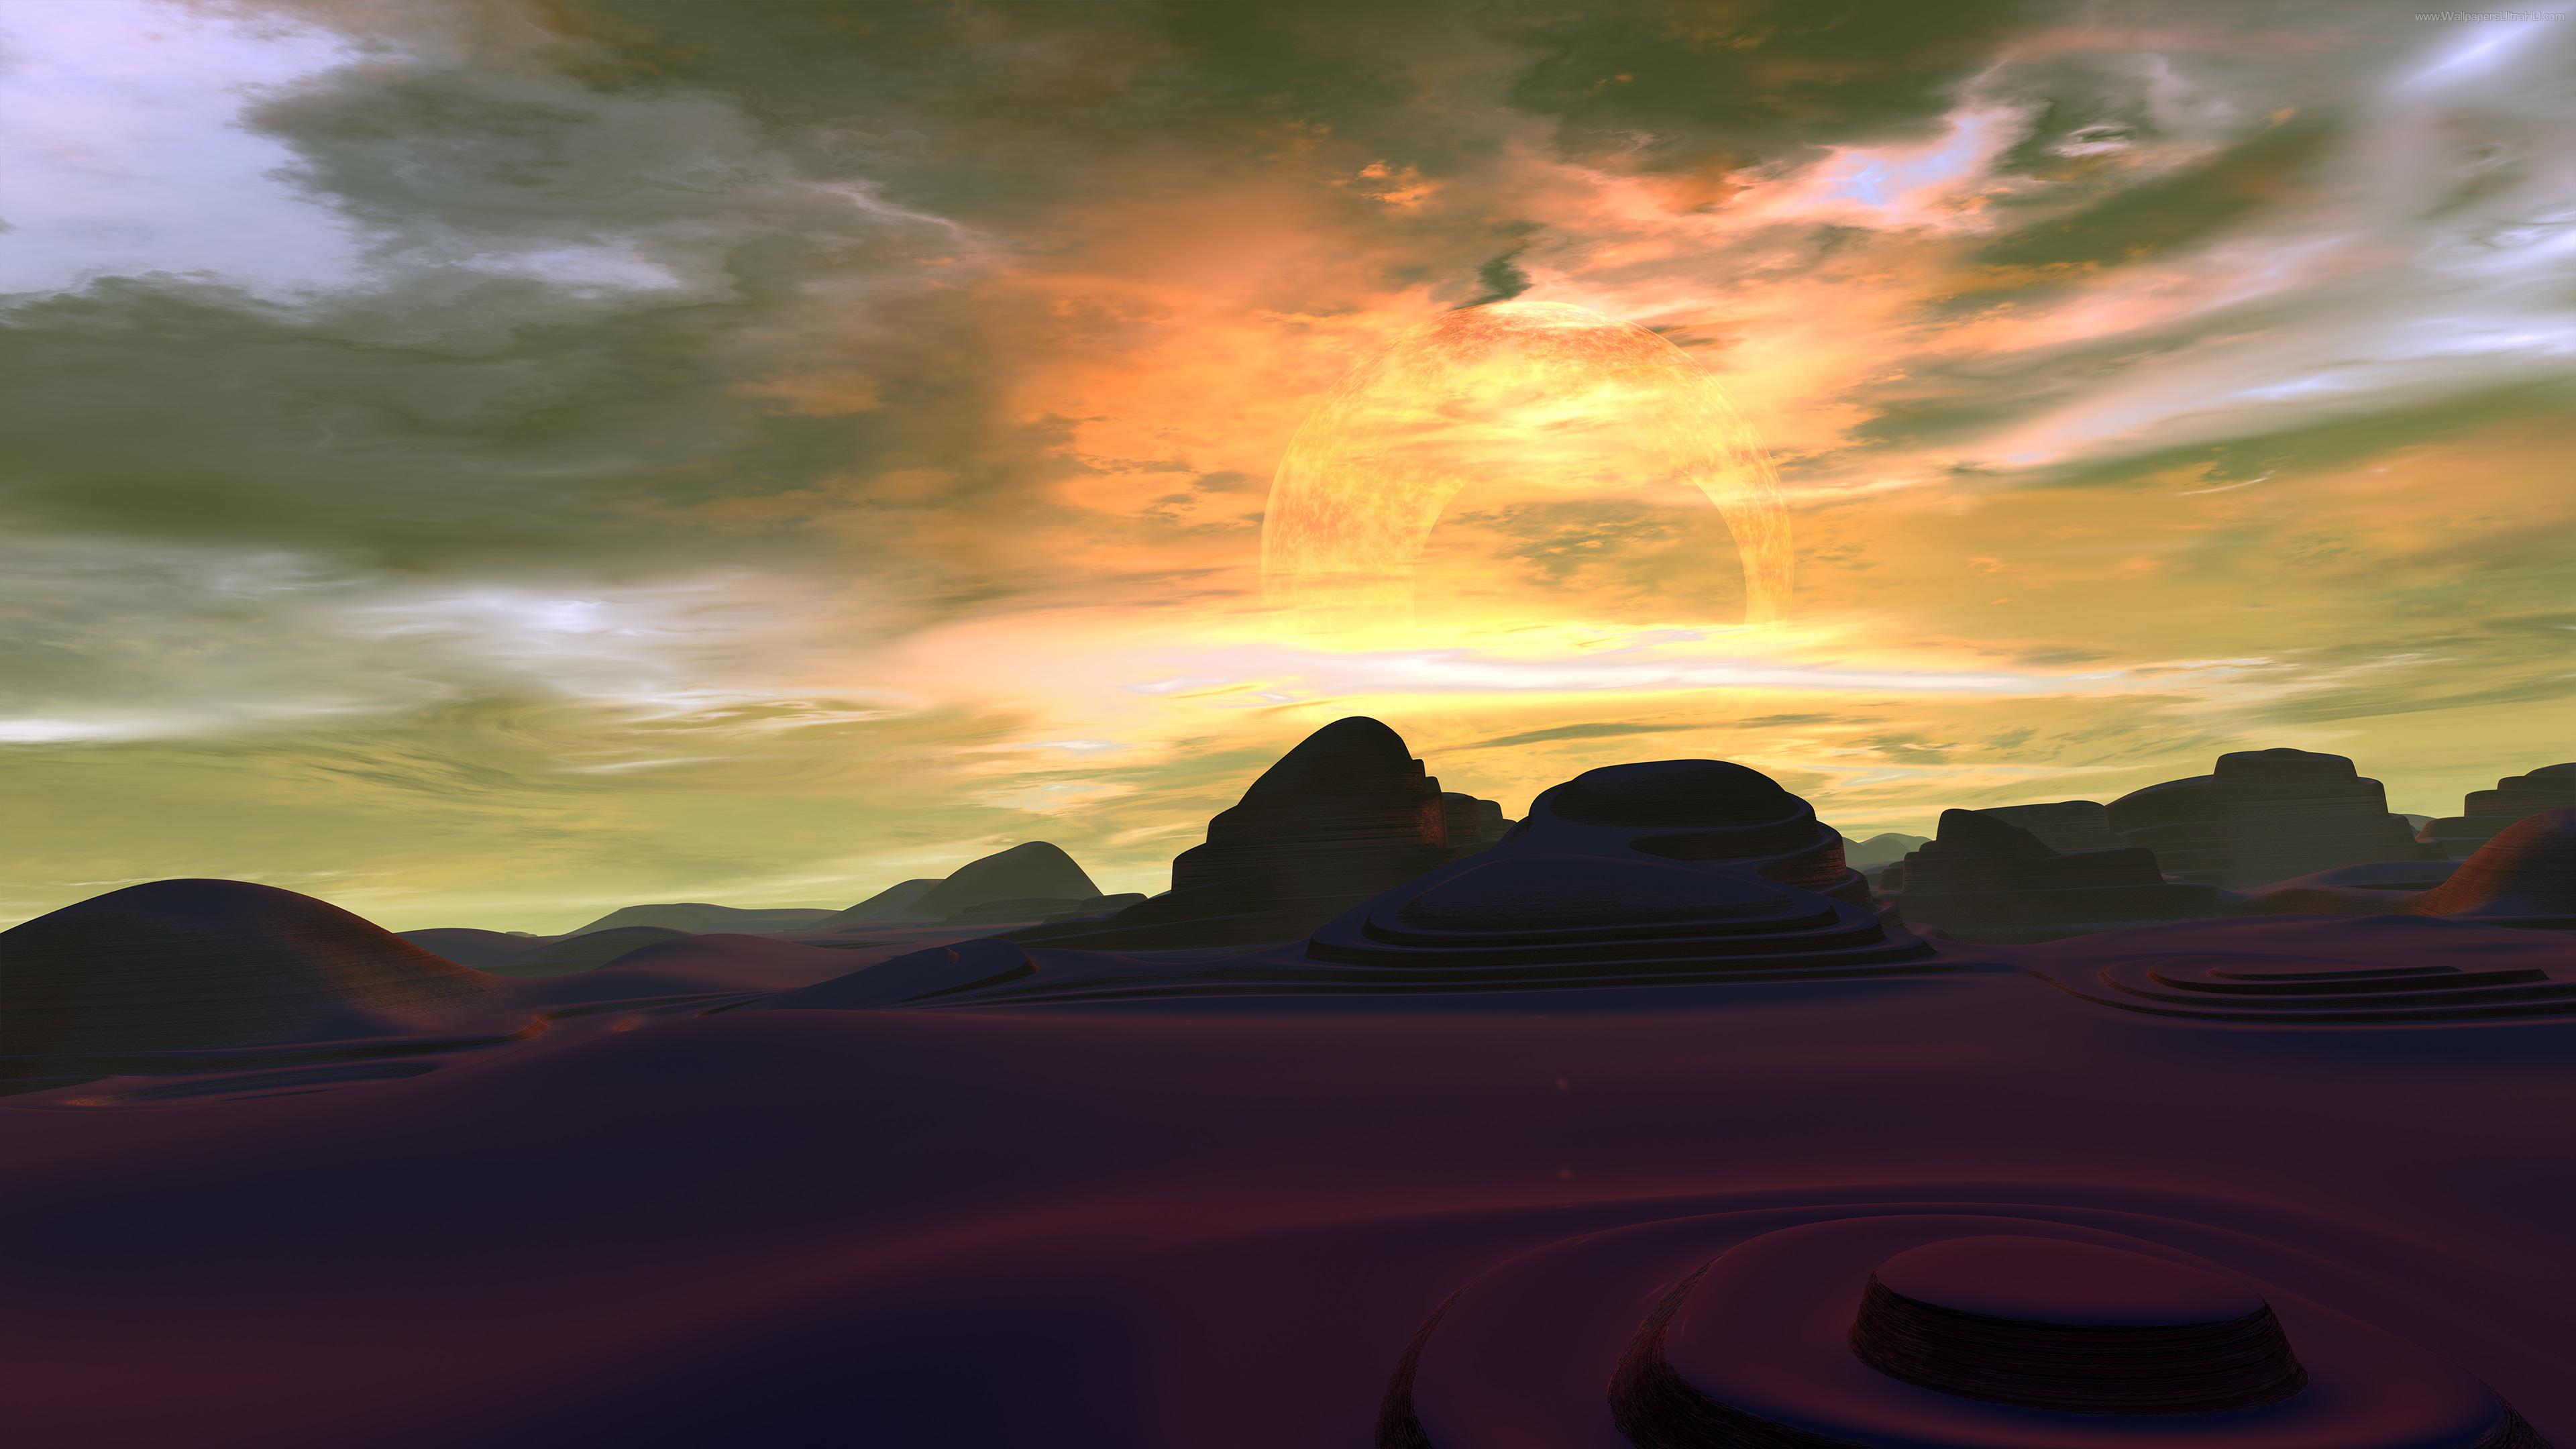 Scifi planet phobos 2K resolution 3840x2160